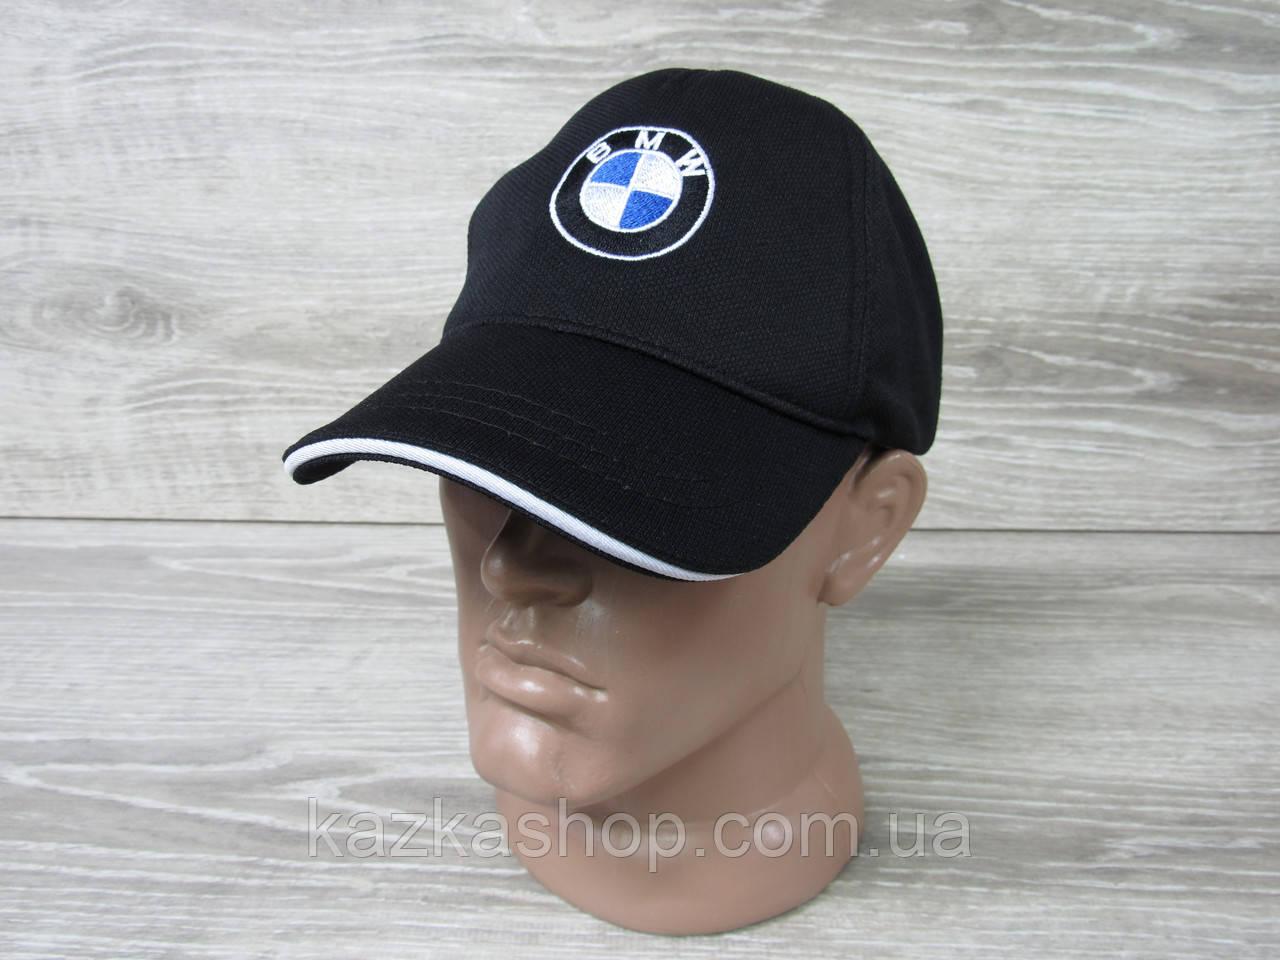 Мужская кепка, бейсболка, вышивка логотипа в стиле BMW (реплика), материал лакоста,  регулятор